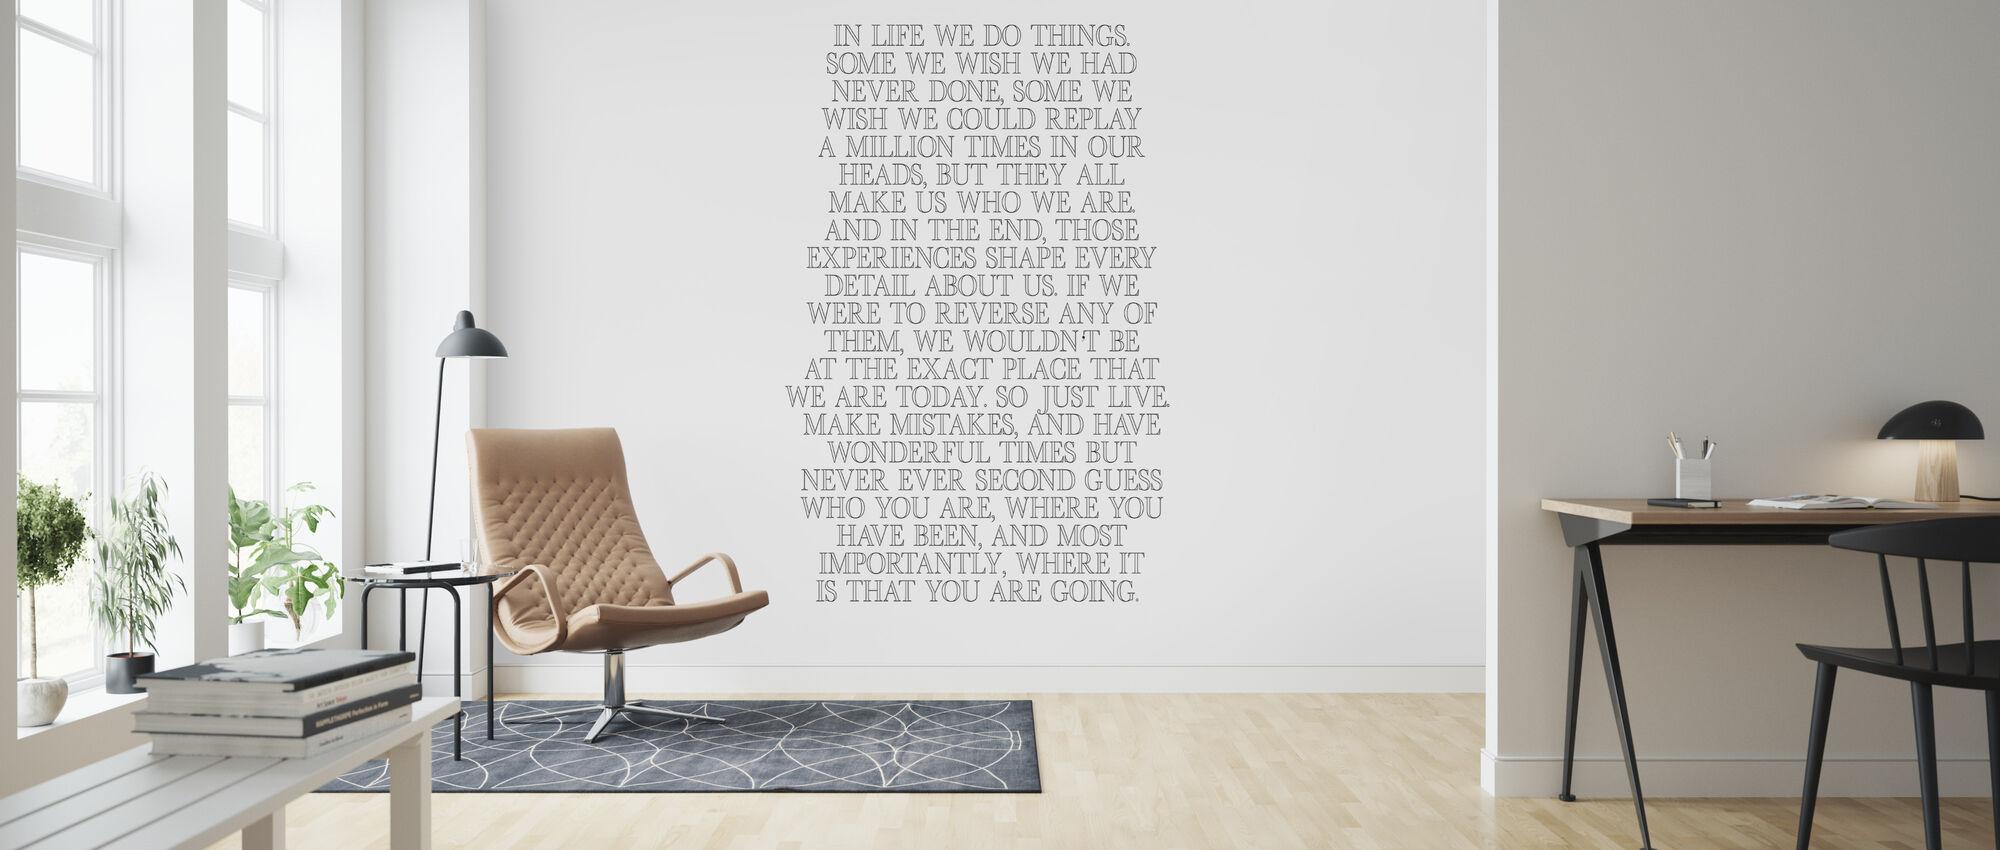 In Life - Wallpaper - Living Room